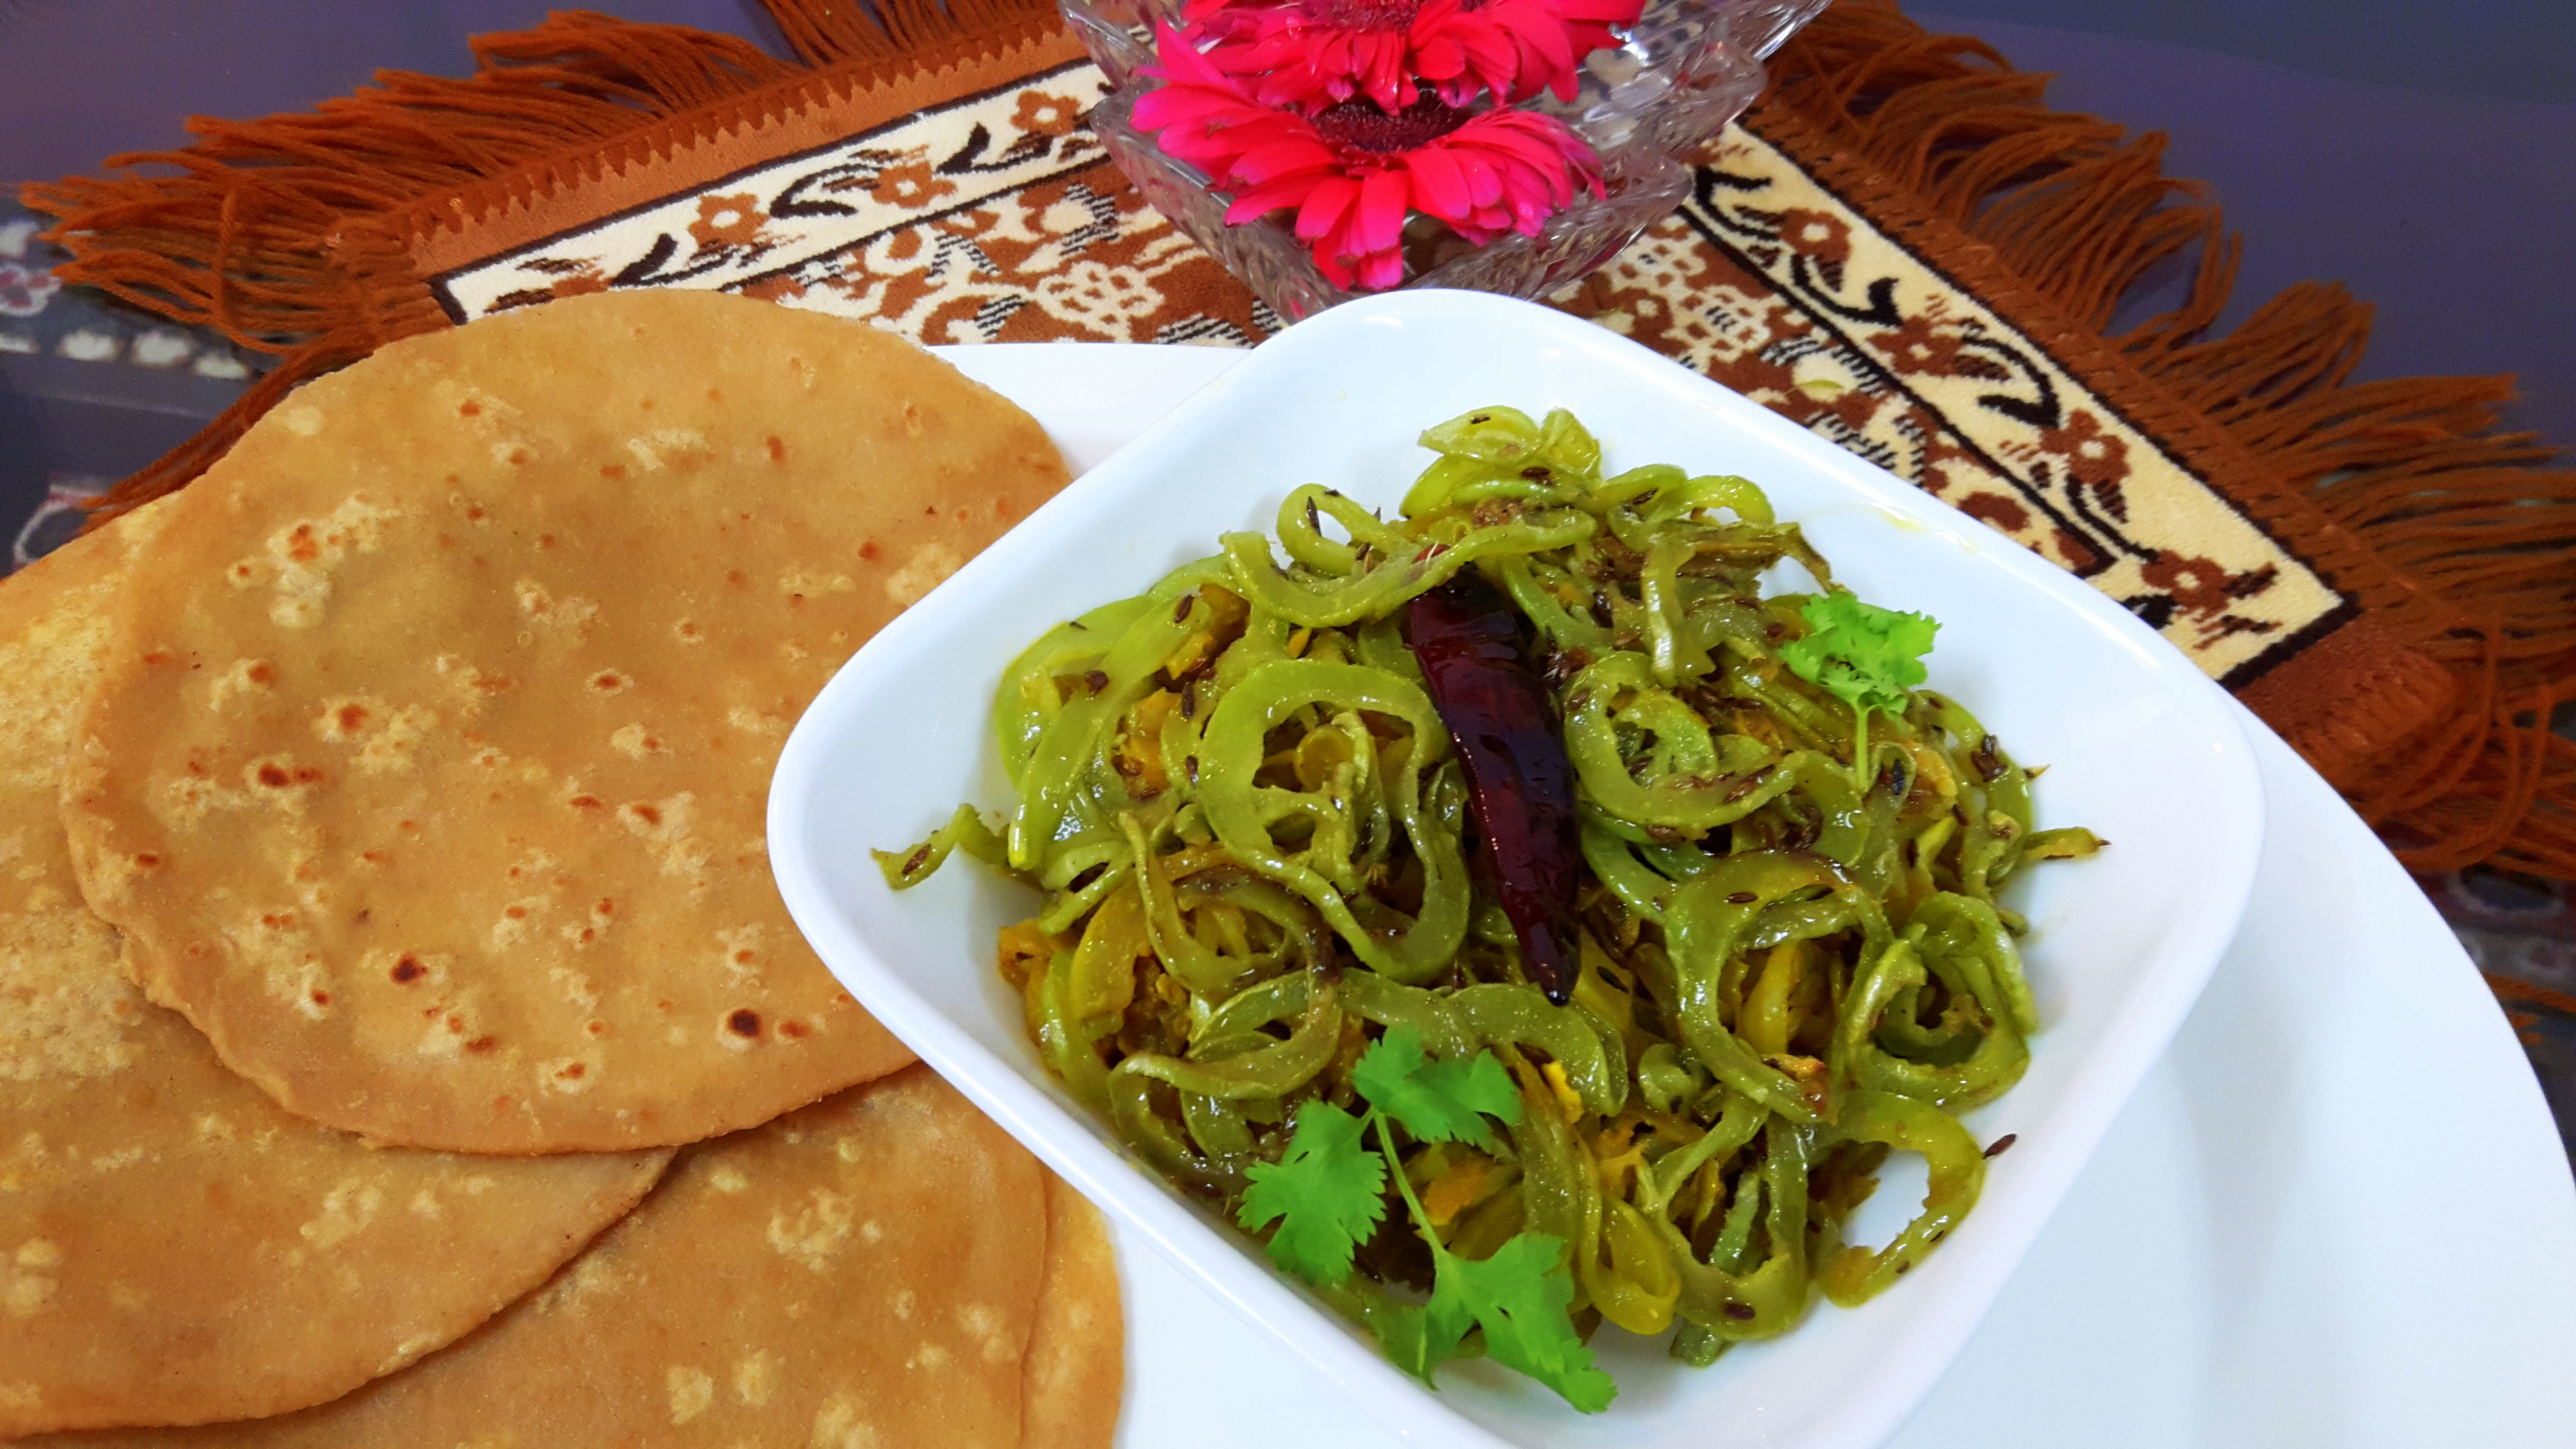 Snake gourd (Trichosanthes cucumerina) ki sabji (chichinda ki sabji)